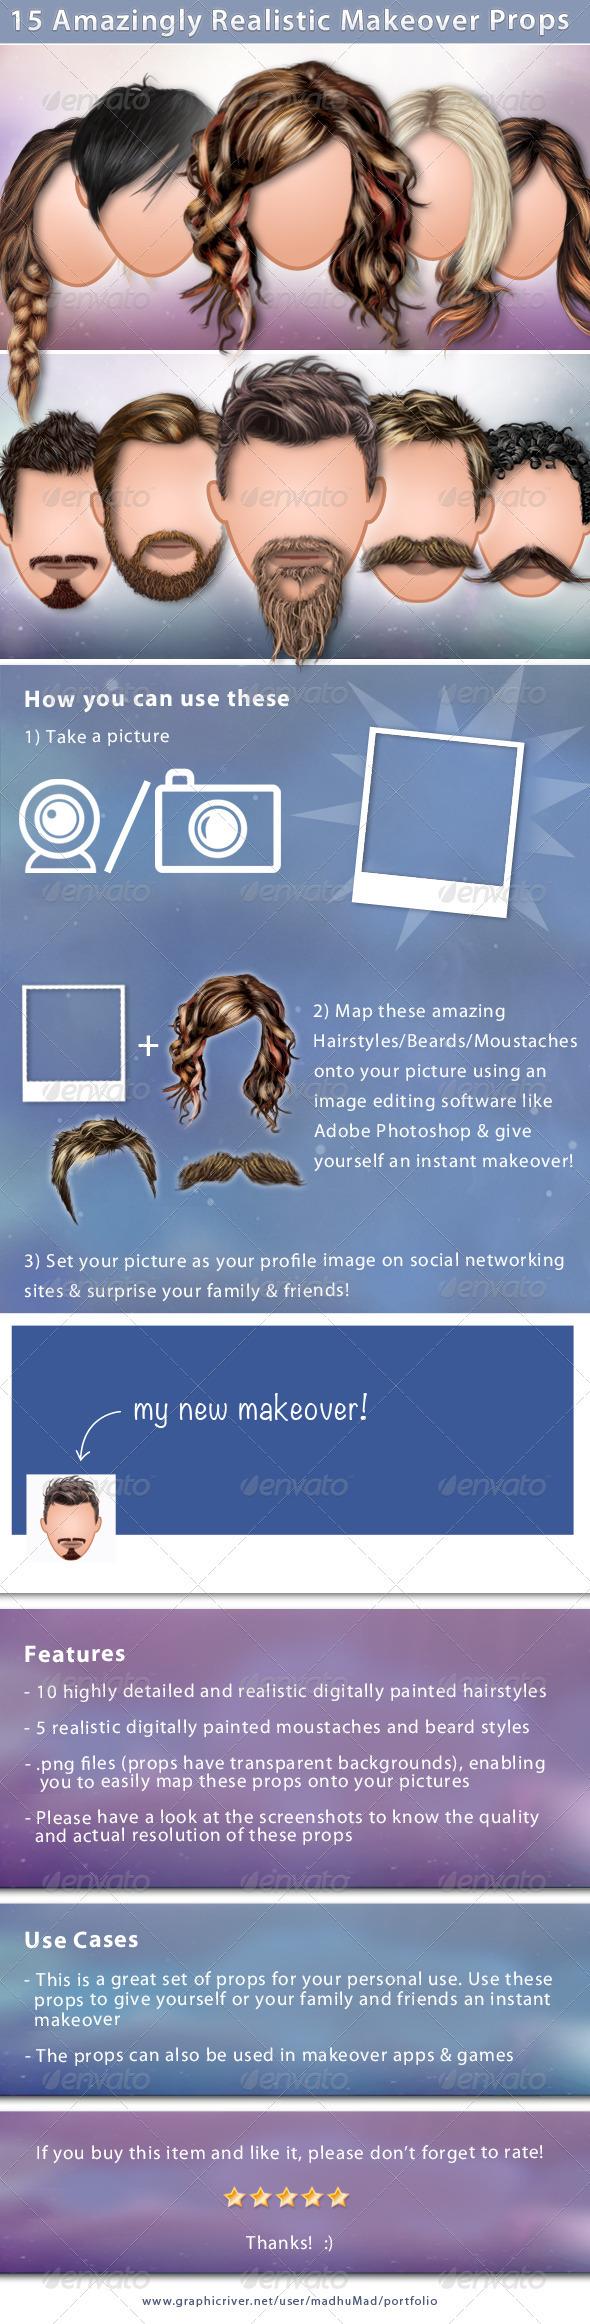 GraphicRiver 15 Realistic Makeover Props 2889156